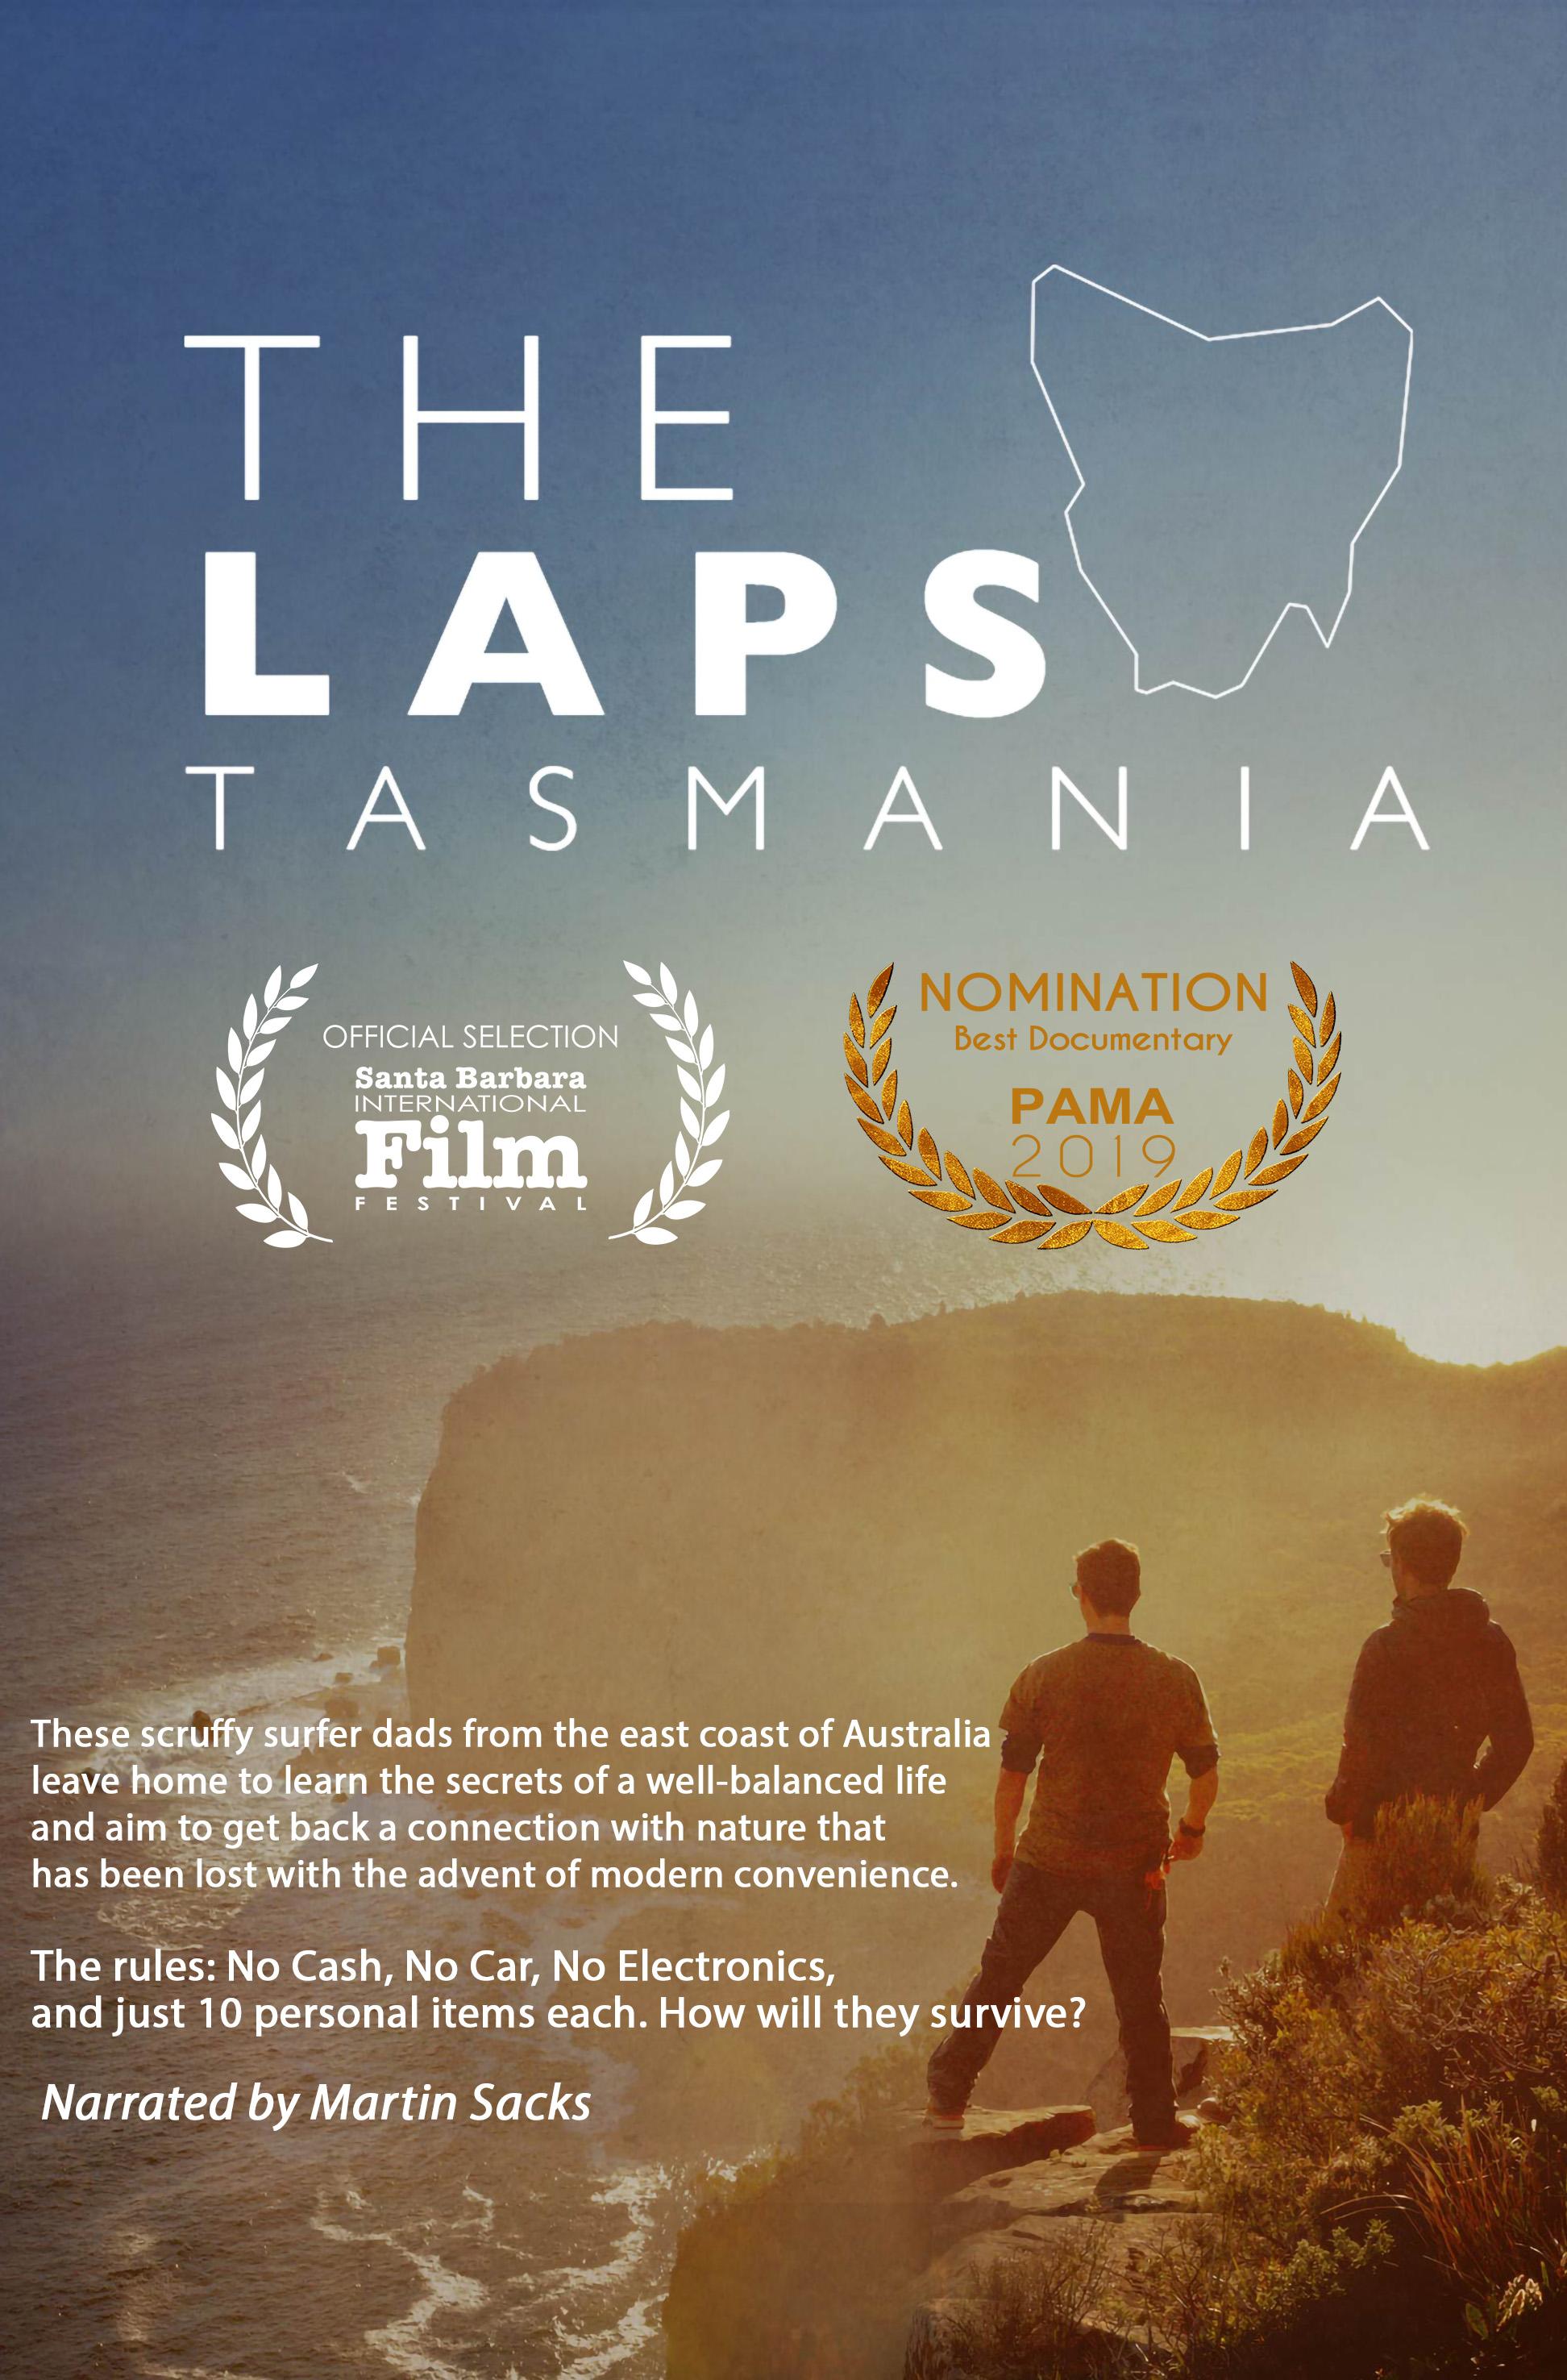 The Laps Tasmania Paris Art and Movie Awards Nomination Best Documentary